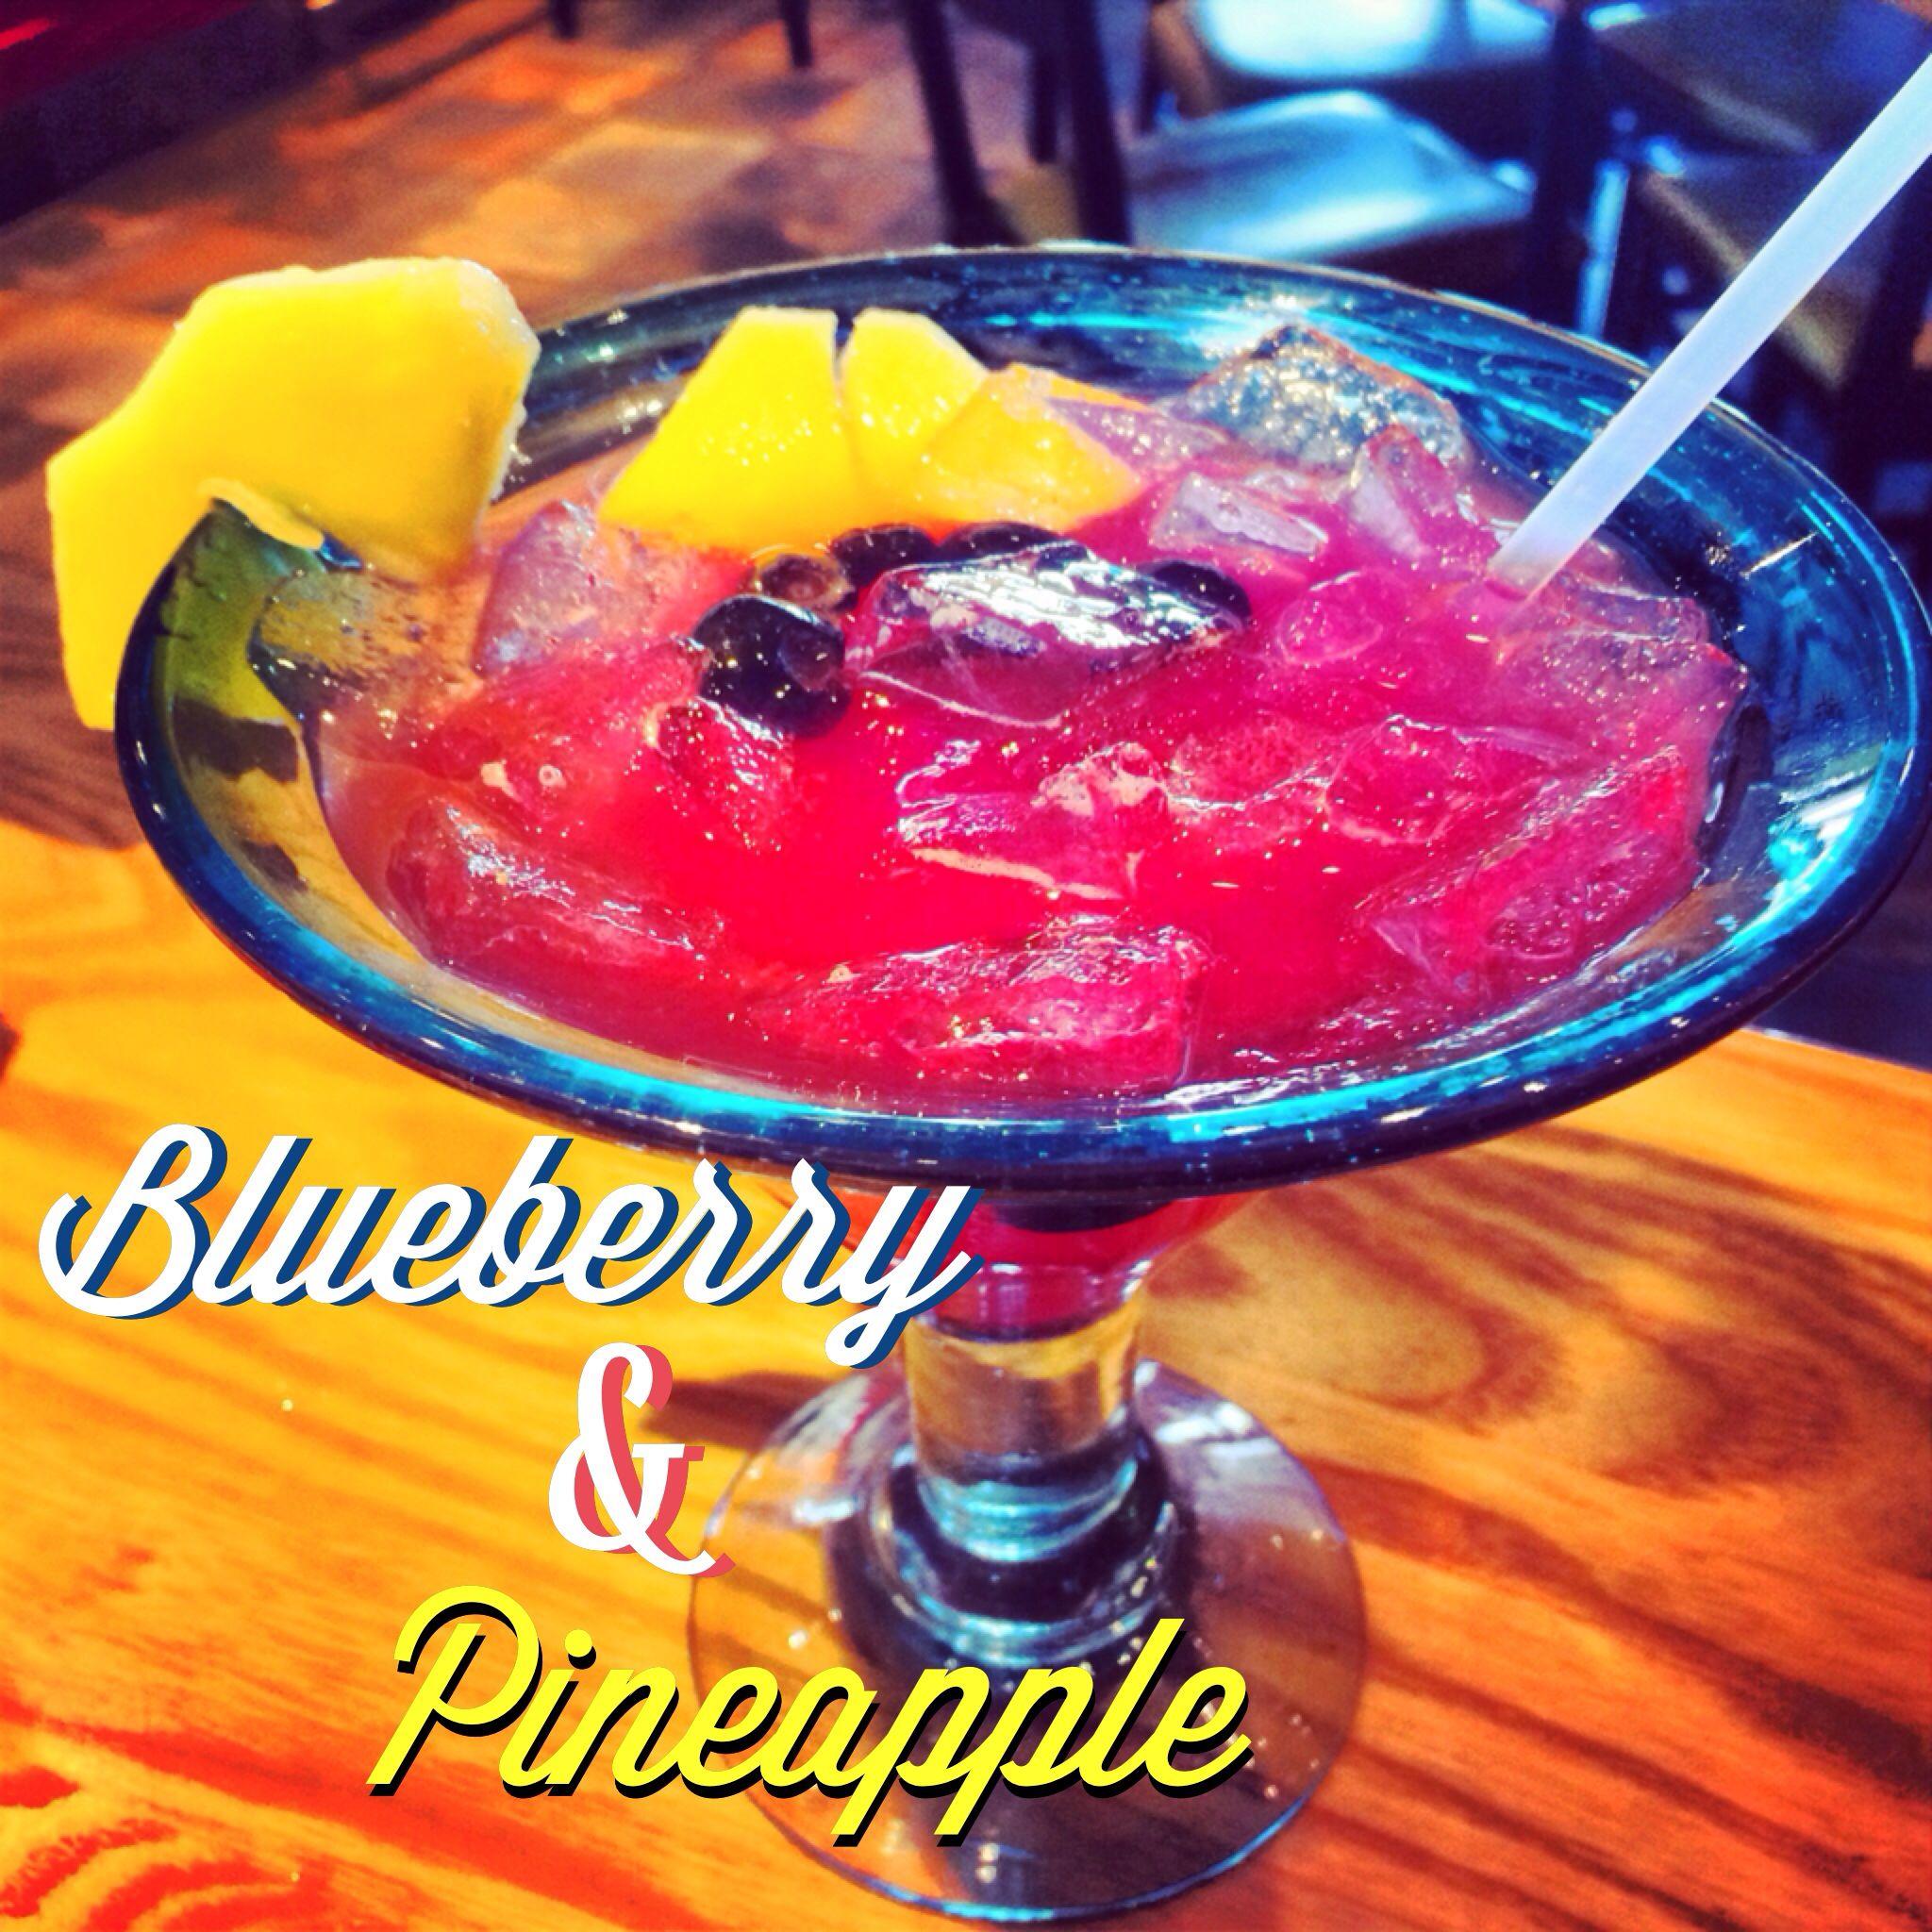 Blueberry & Pineapple Margarita From Chili's Jose Cuervo